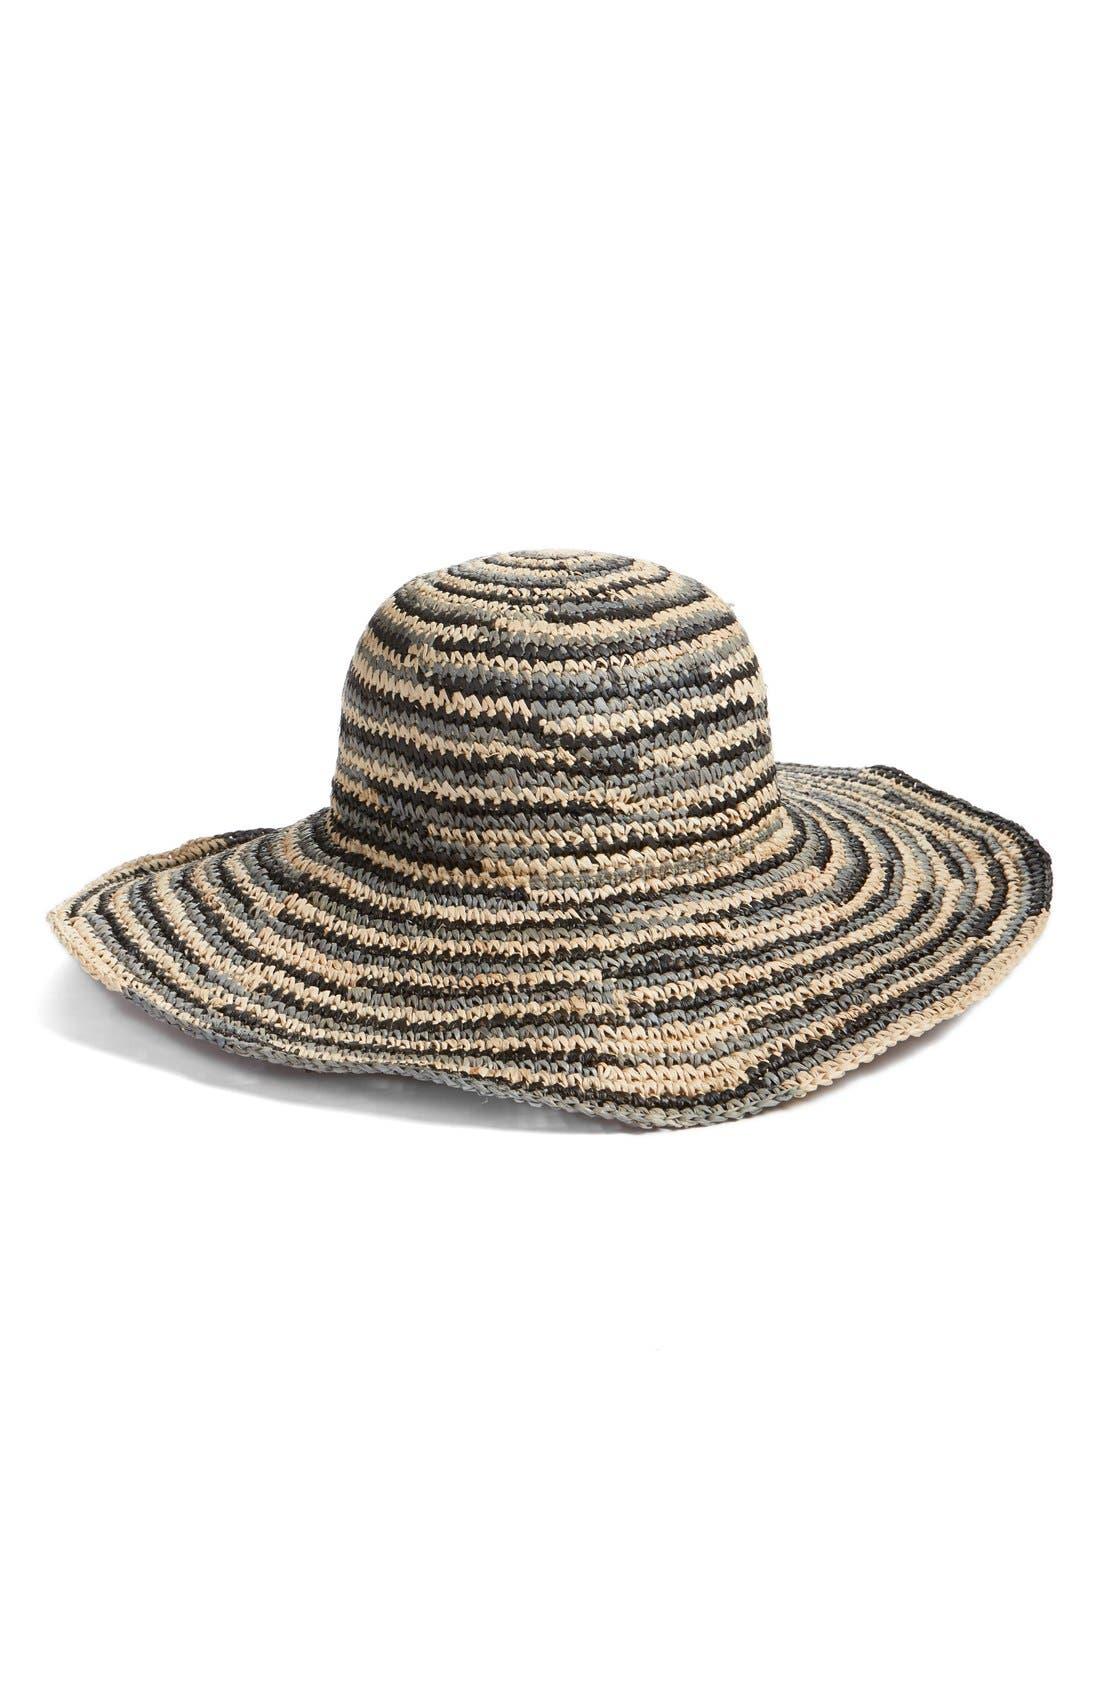 Alternate Image 1 Selected - Caslon® Raffia Floppy Brim Hat